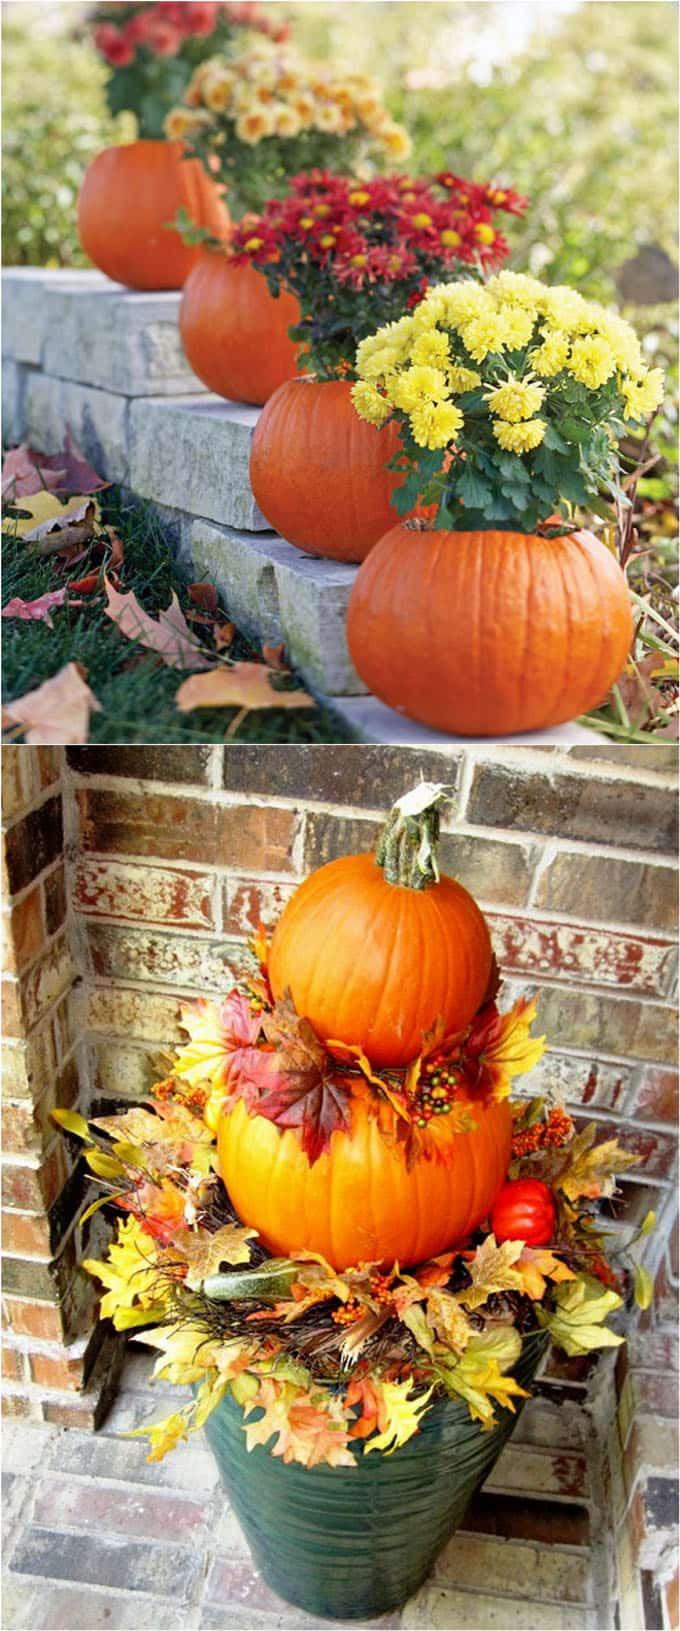 Diy Outdoor Fall Decor  25 Splendid Front Door DIY Fall Decorations A Piece